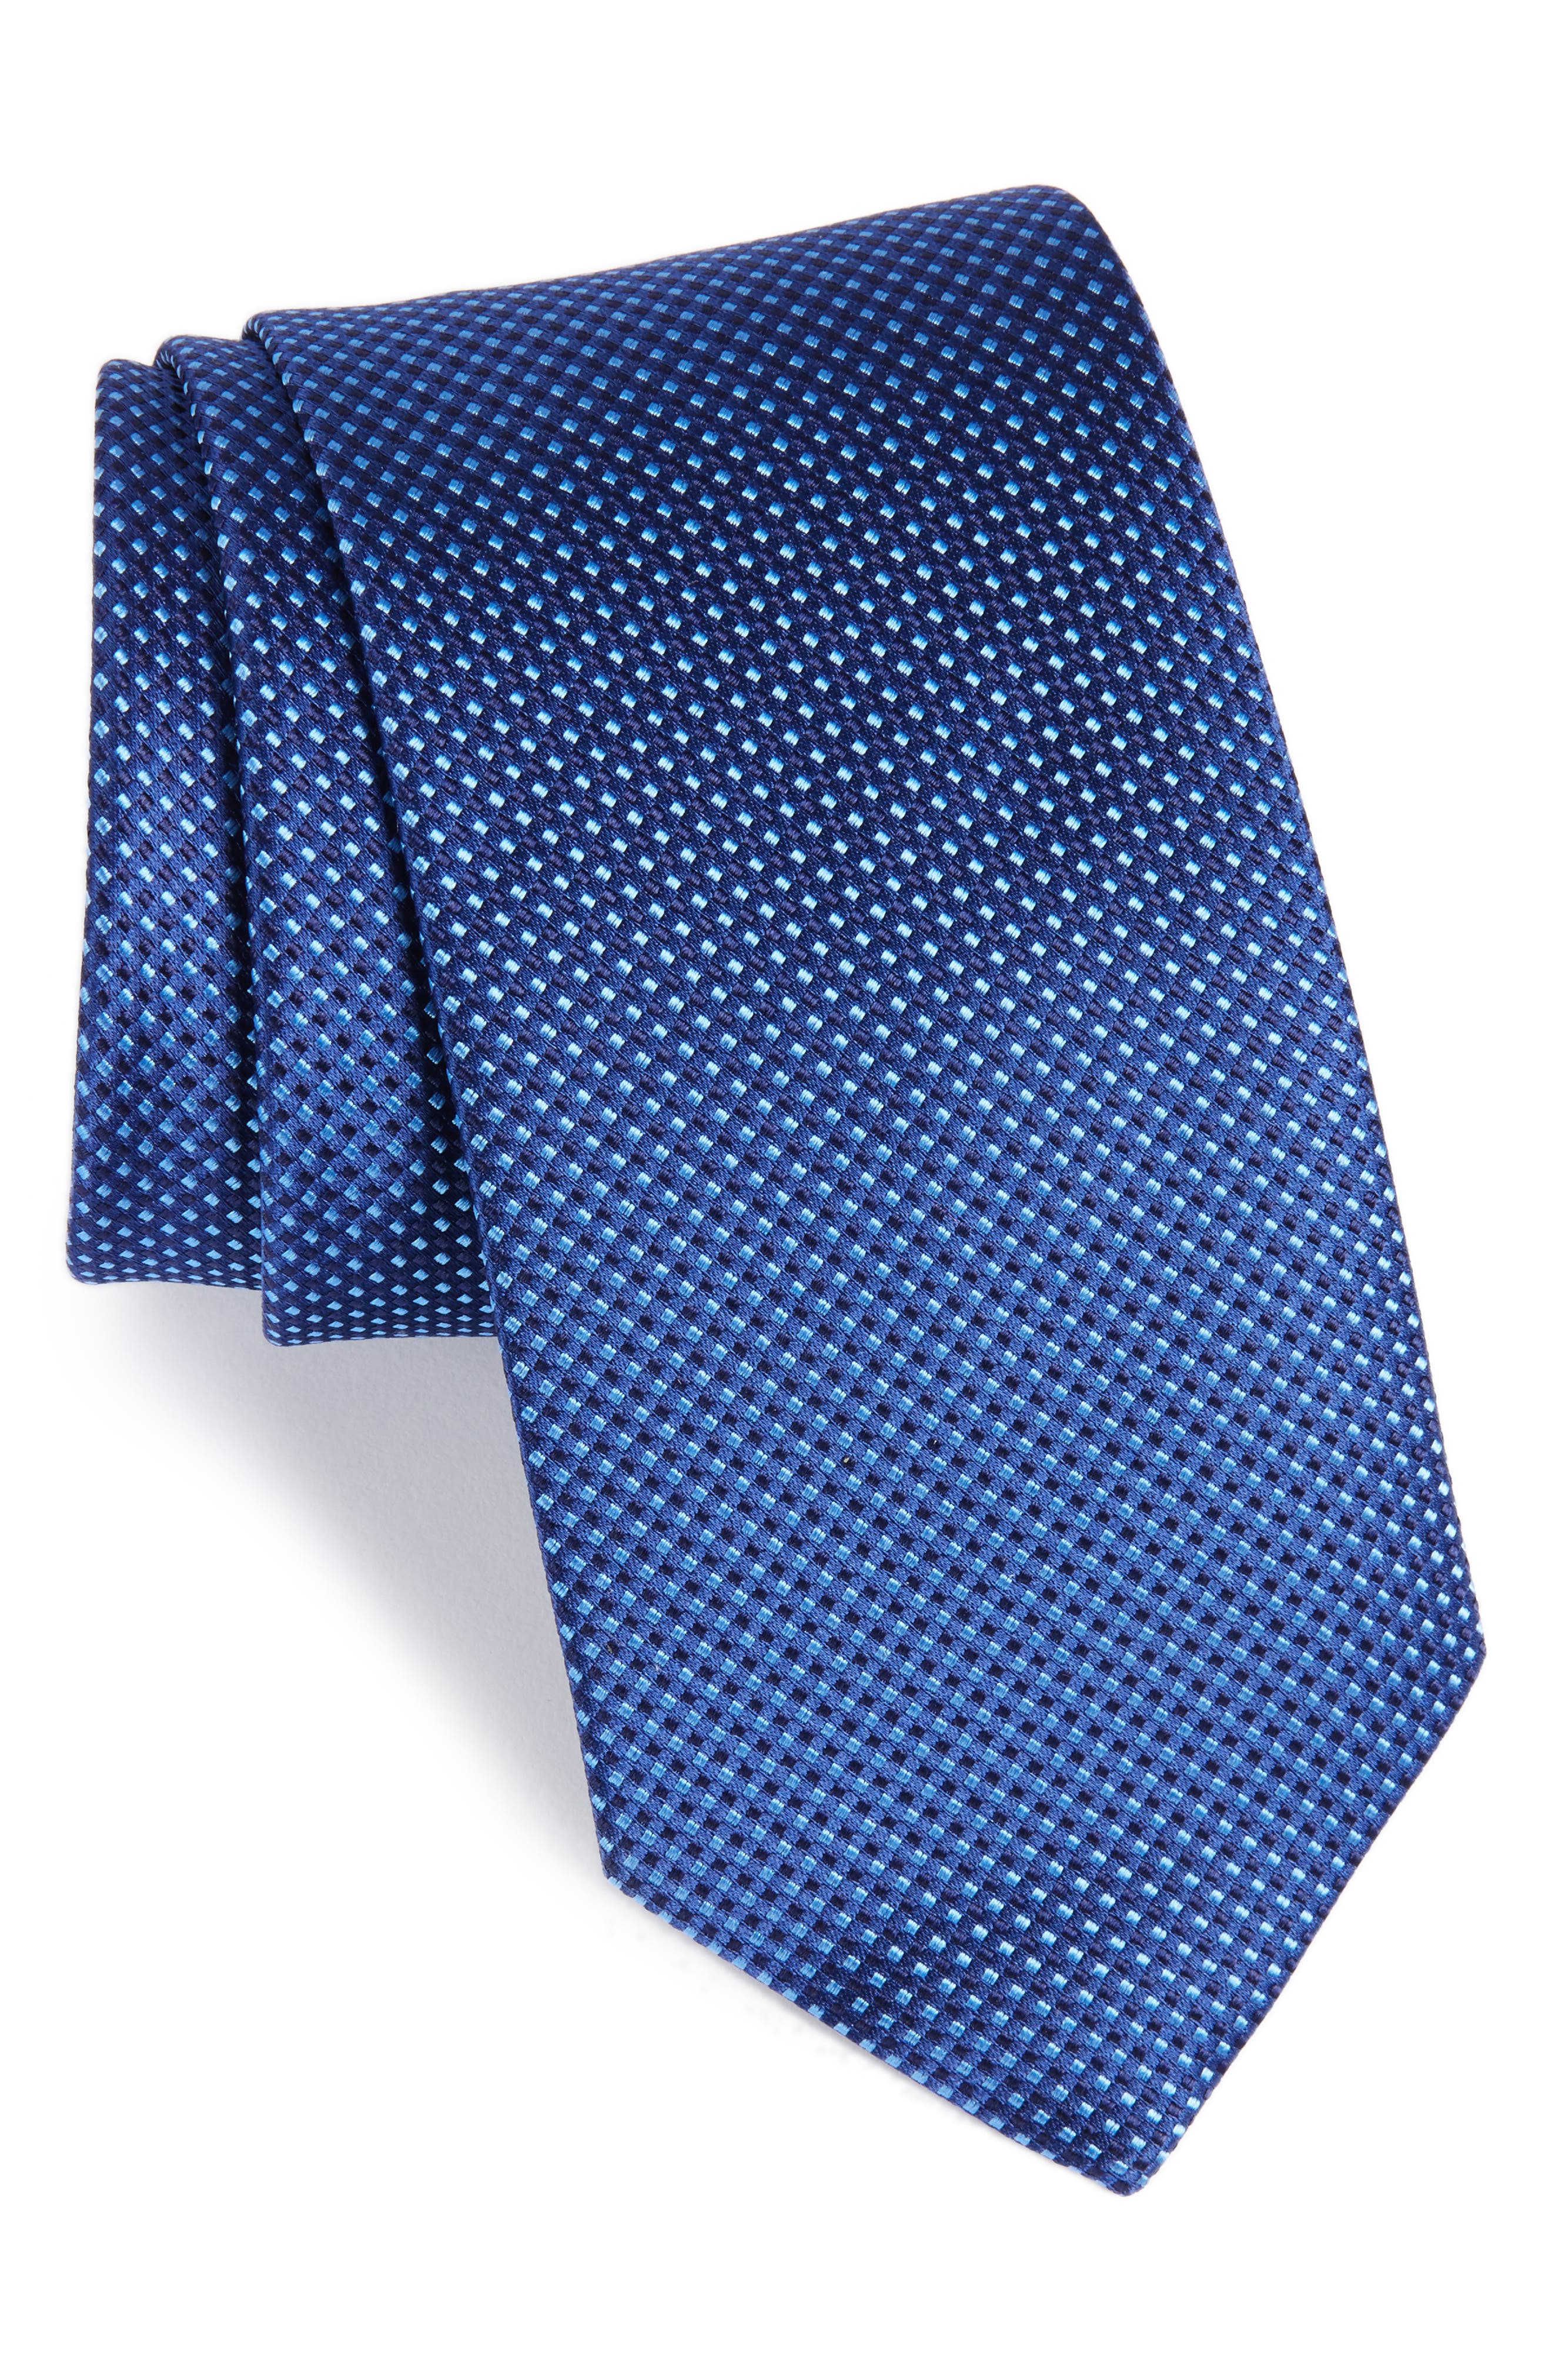 Microdot Silk Tie,                         Main,                         color, 400